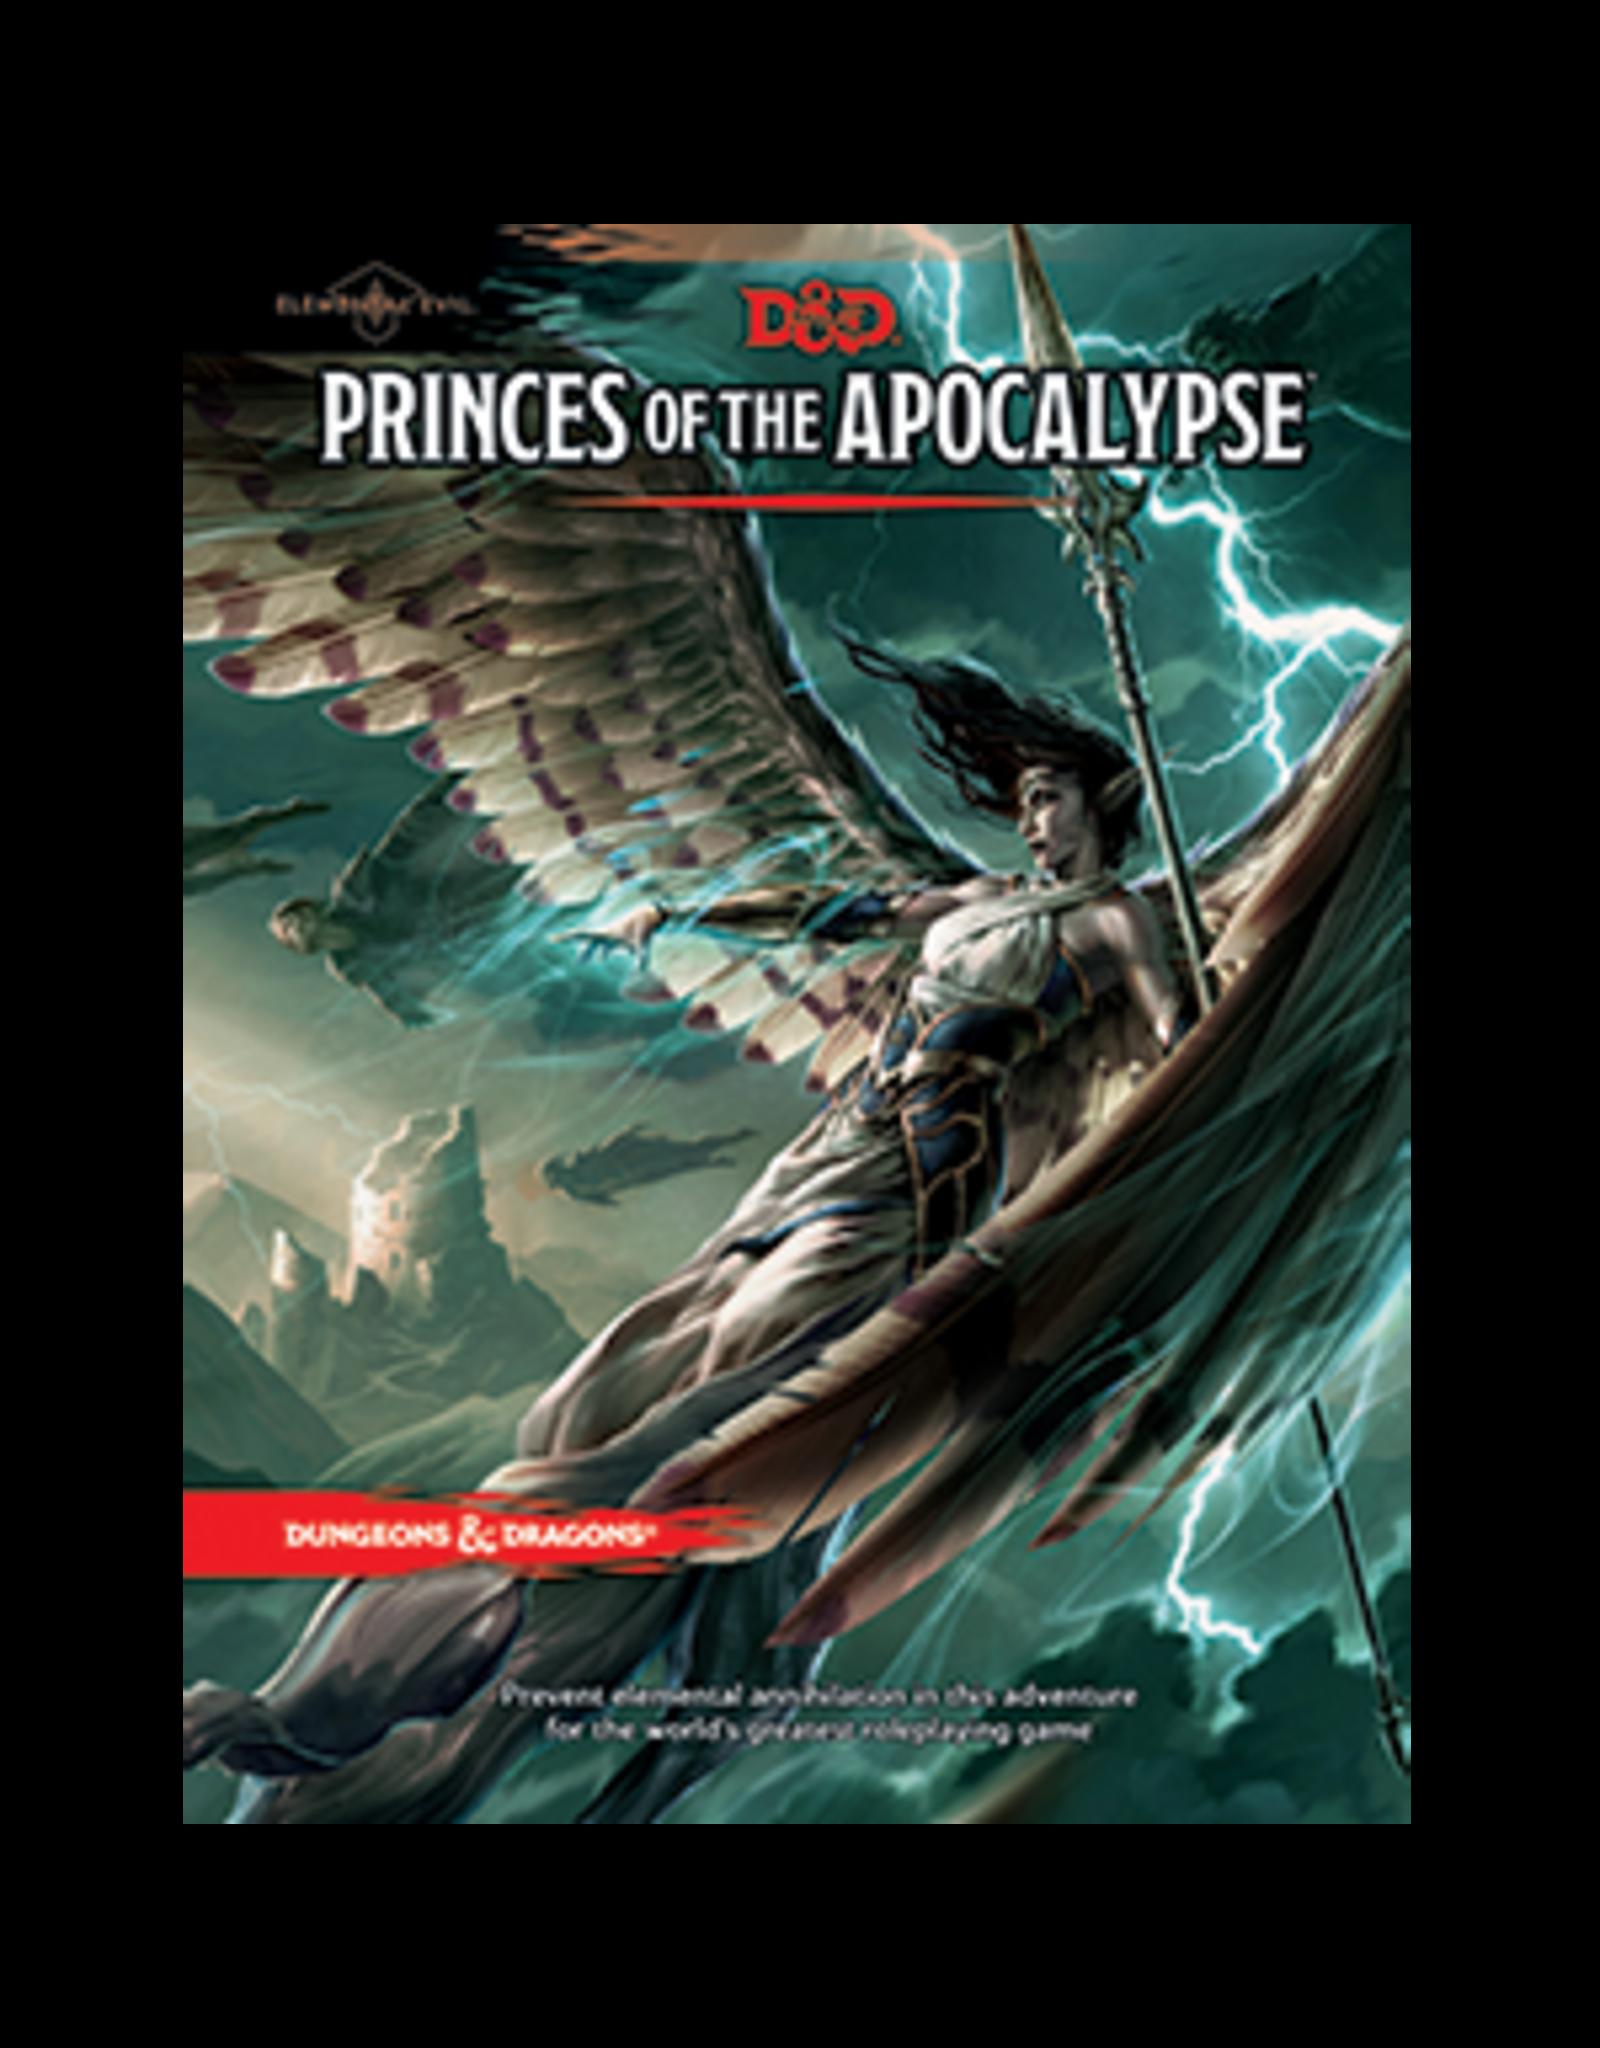 Dungeons & Dragons D&D 5E Princes of the Apocalypse